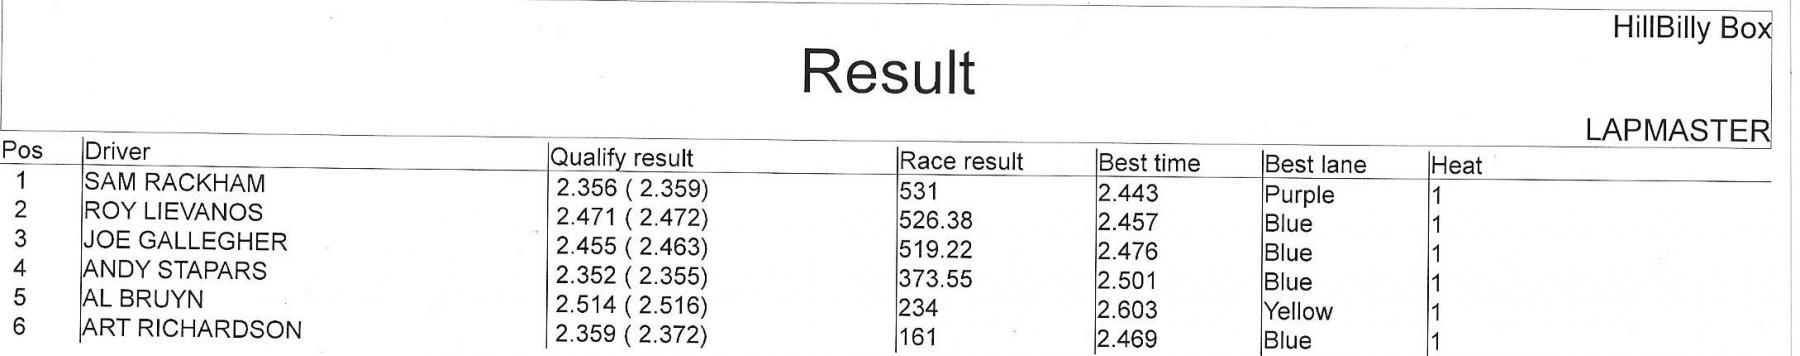 662020 hillbilly results.jpeg